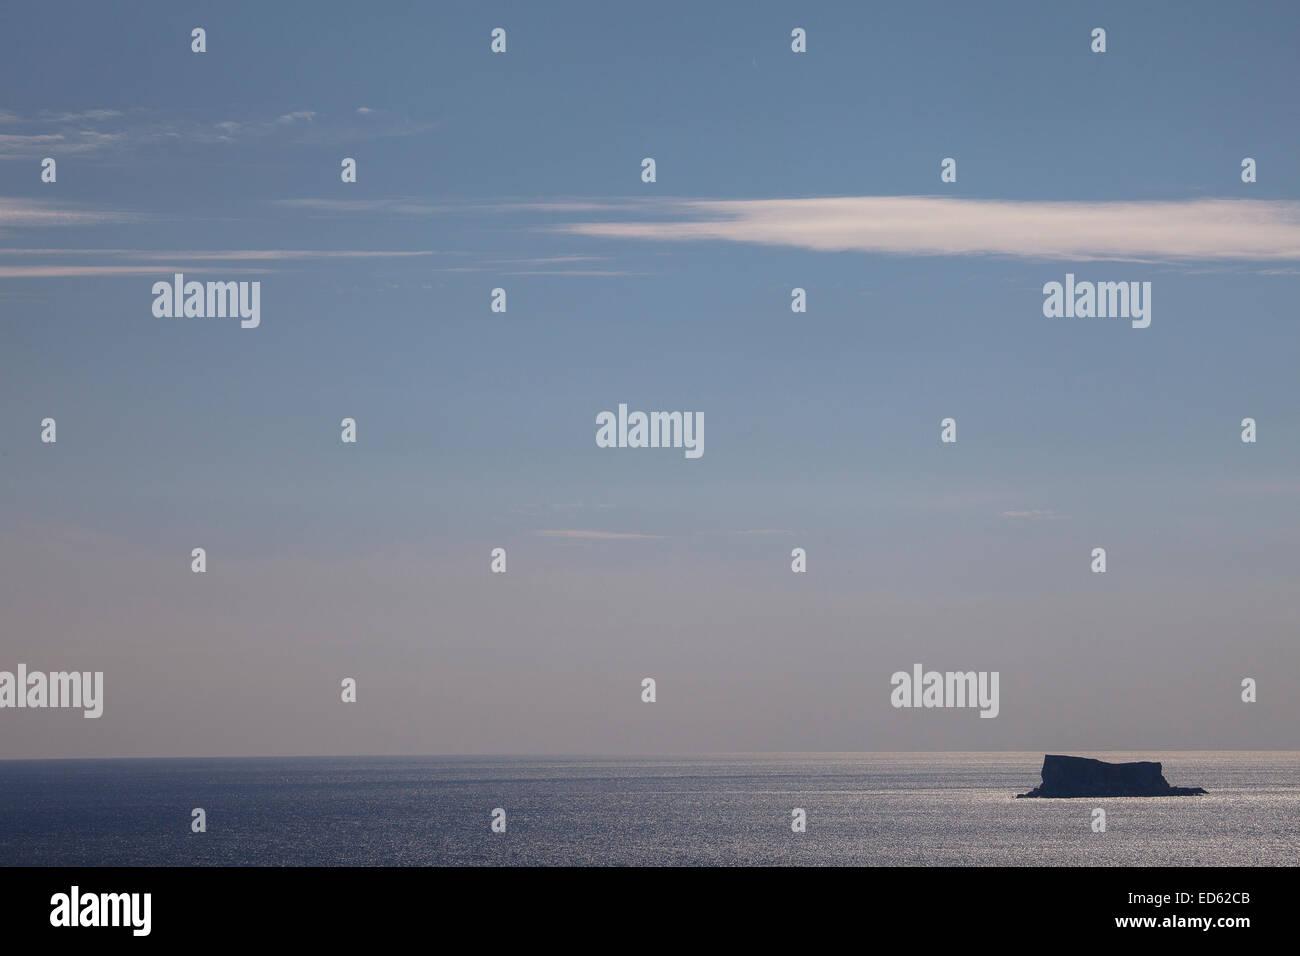 Filfta islet. Malta. Europa - Stock Image